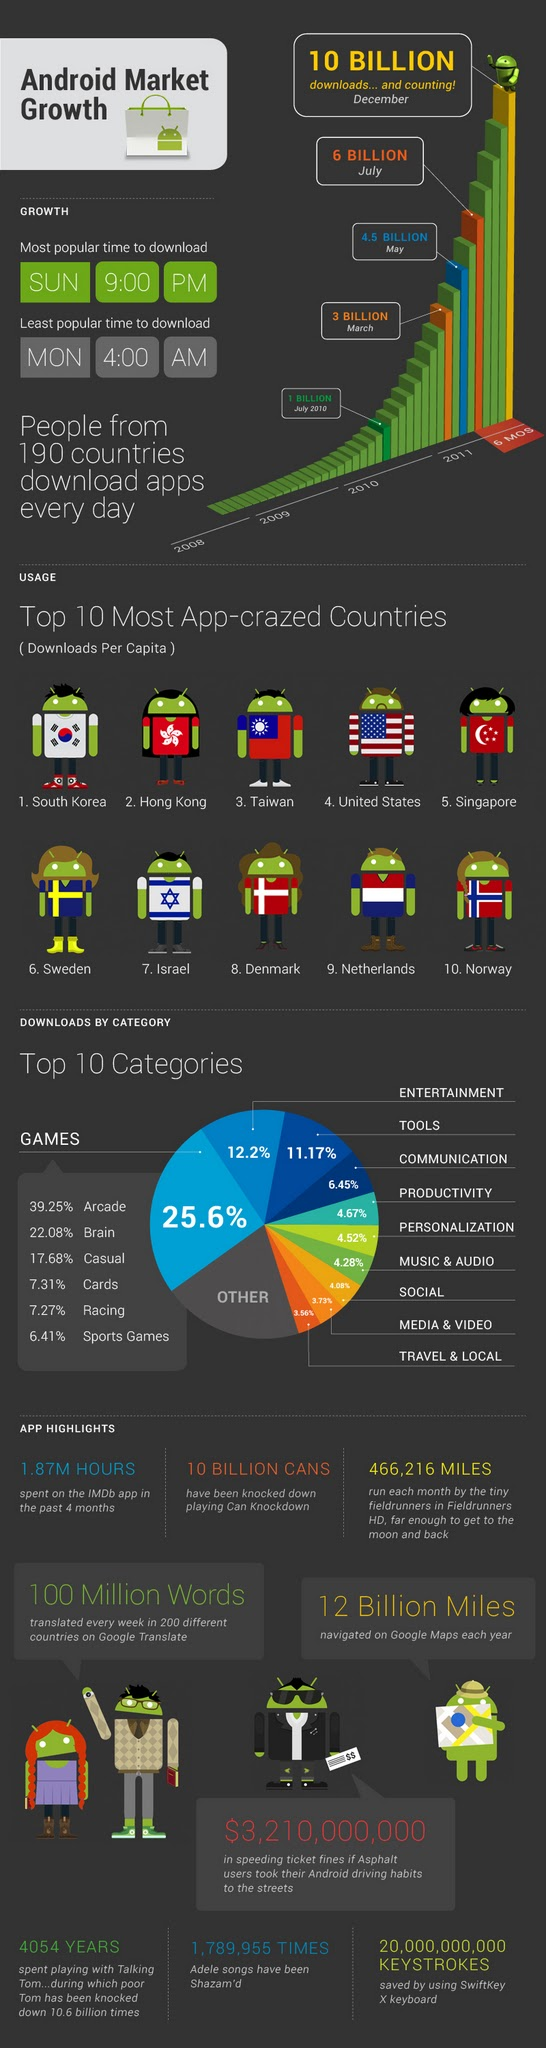 Структура та динаміка Android Market (інфографіка)